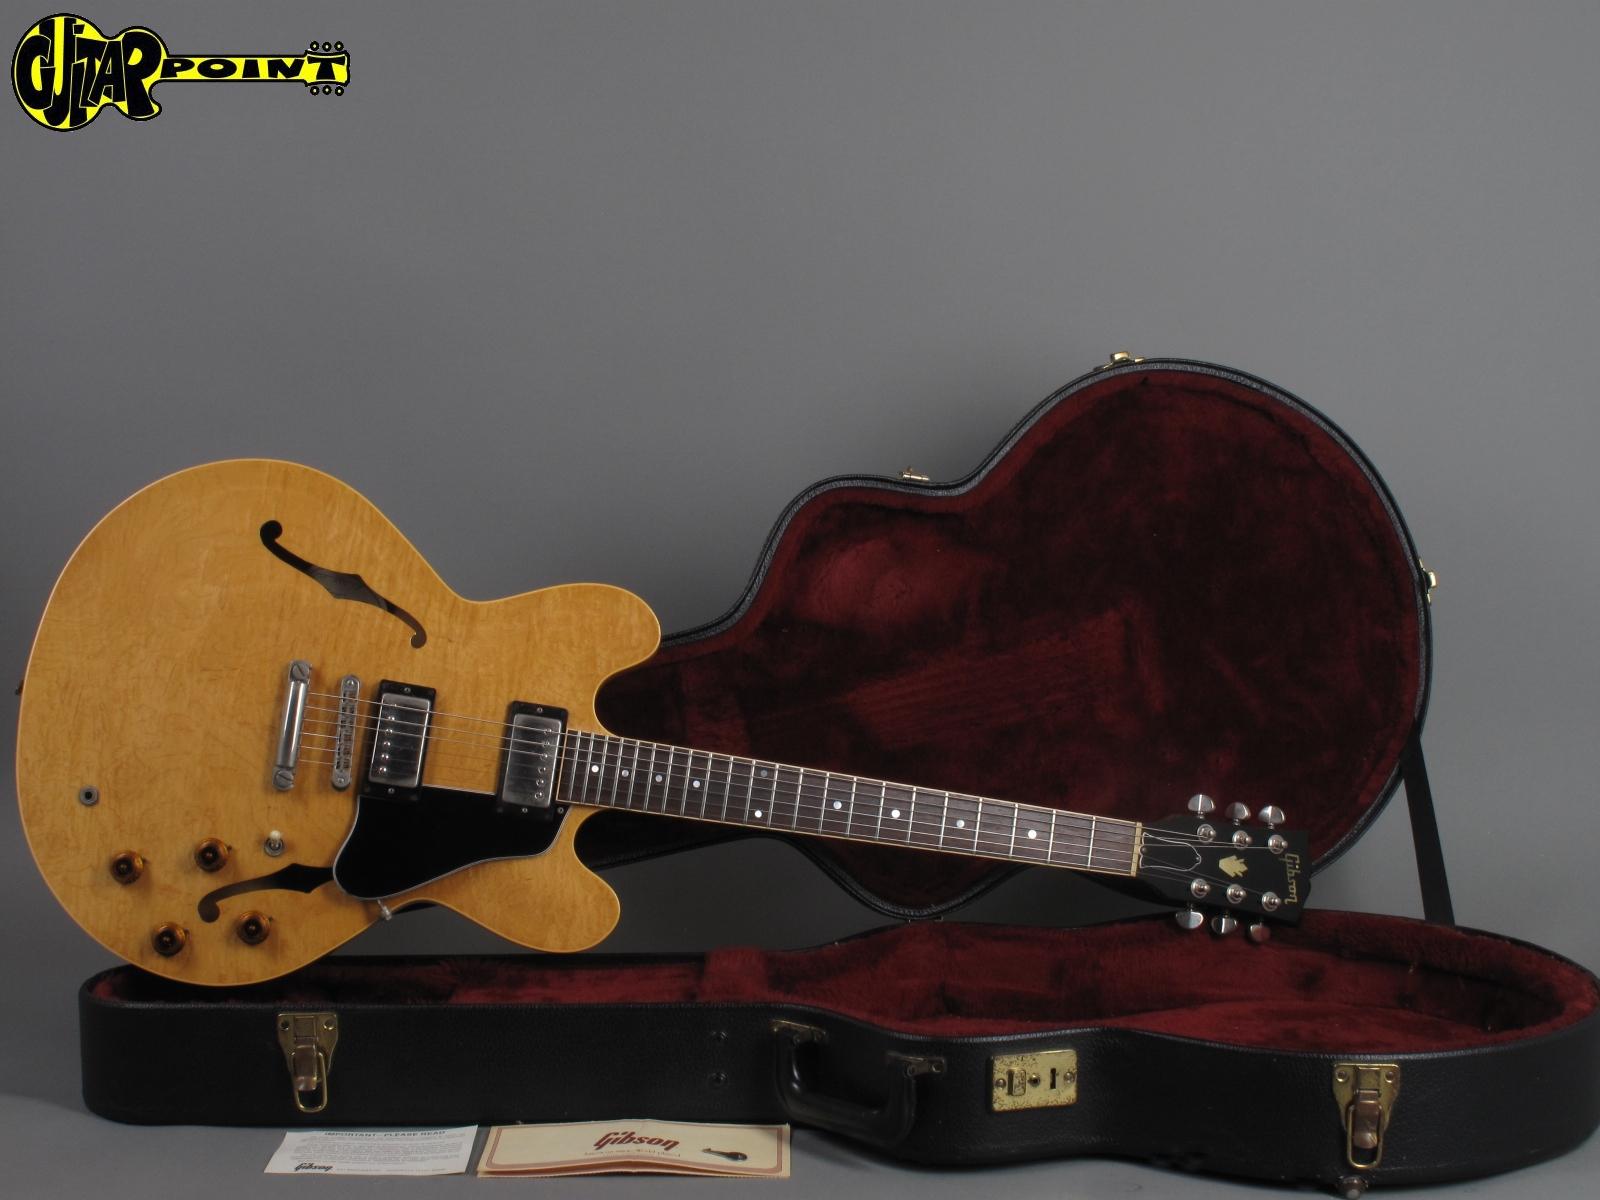 https://guitarpoint.de/app/uploads/products/1984-gibson-es-335-dot-custom-shop-antique-natural-2/Gibson84ES335DotRiNT81584509_41.jpg